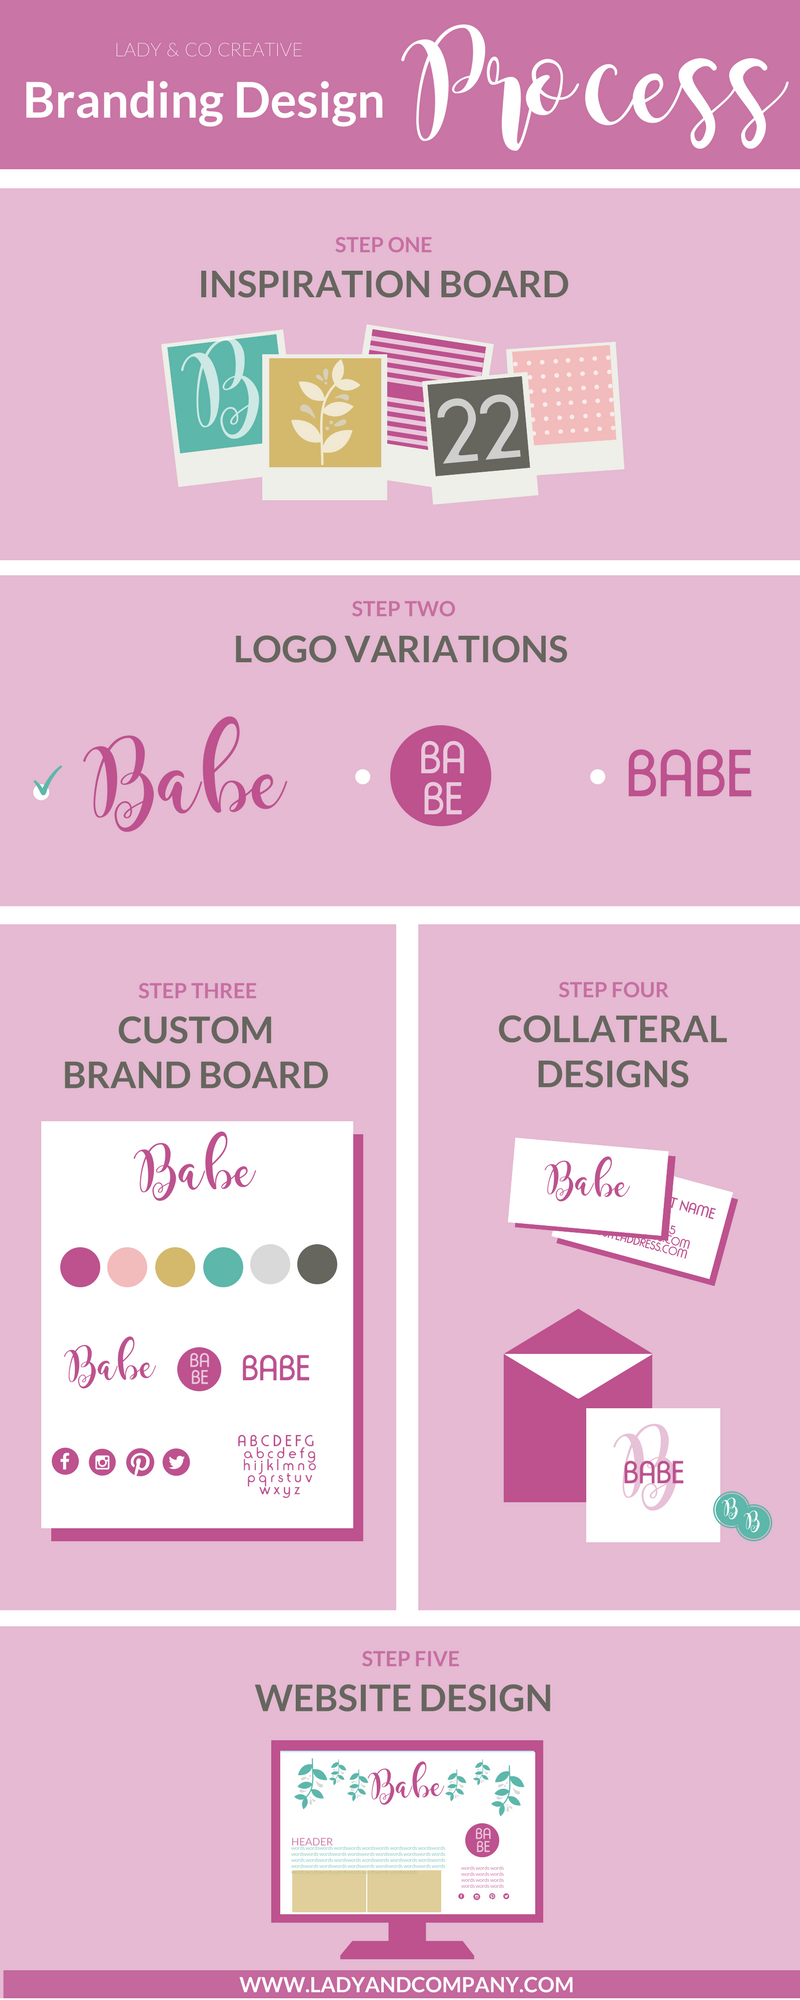 5 step branding design process | Lady and Company Creative